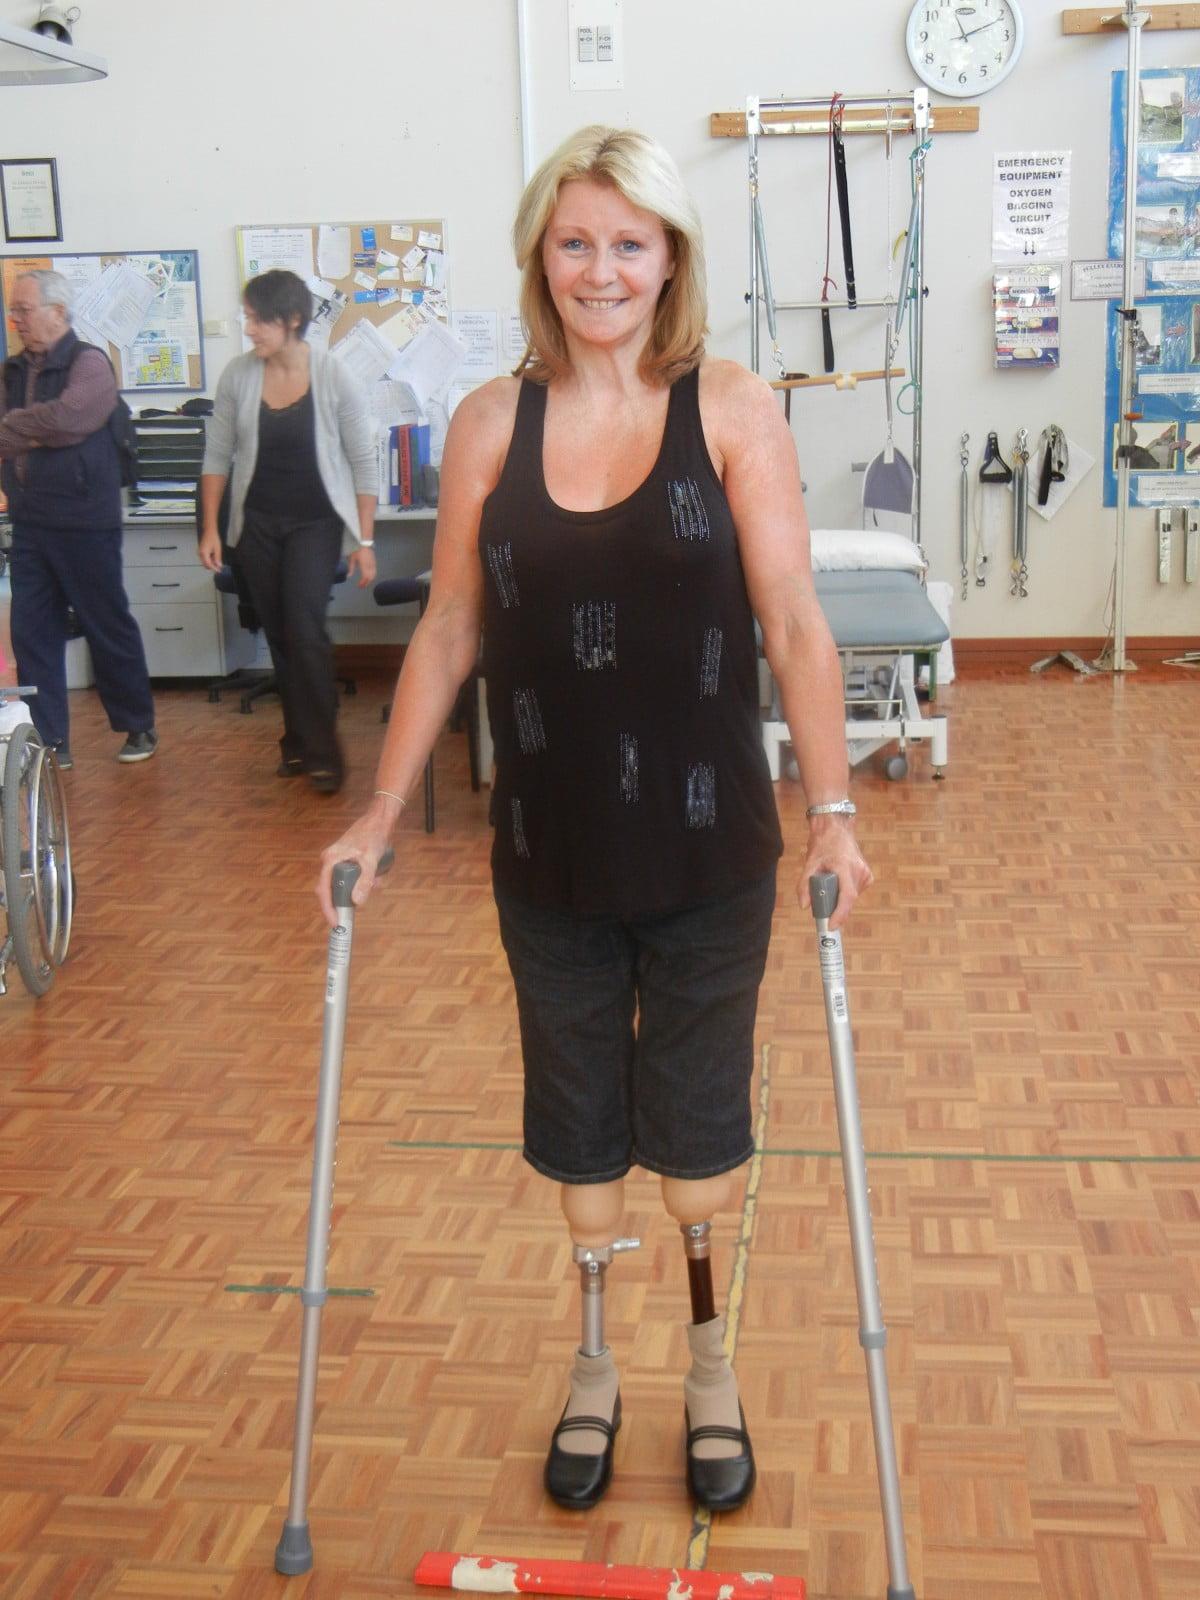 Amanda 2 bare prosthetic legs